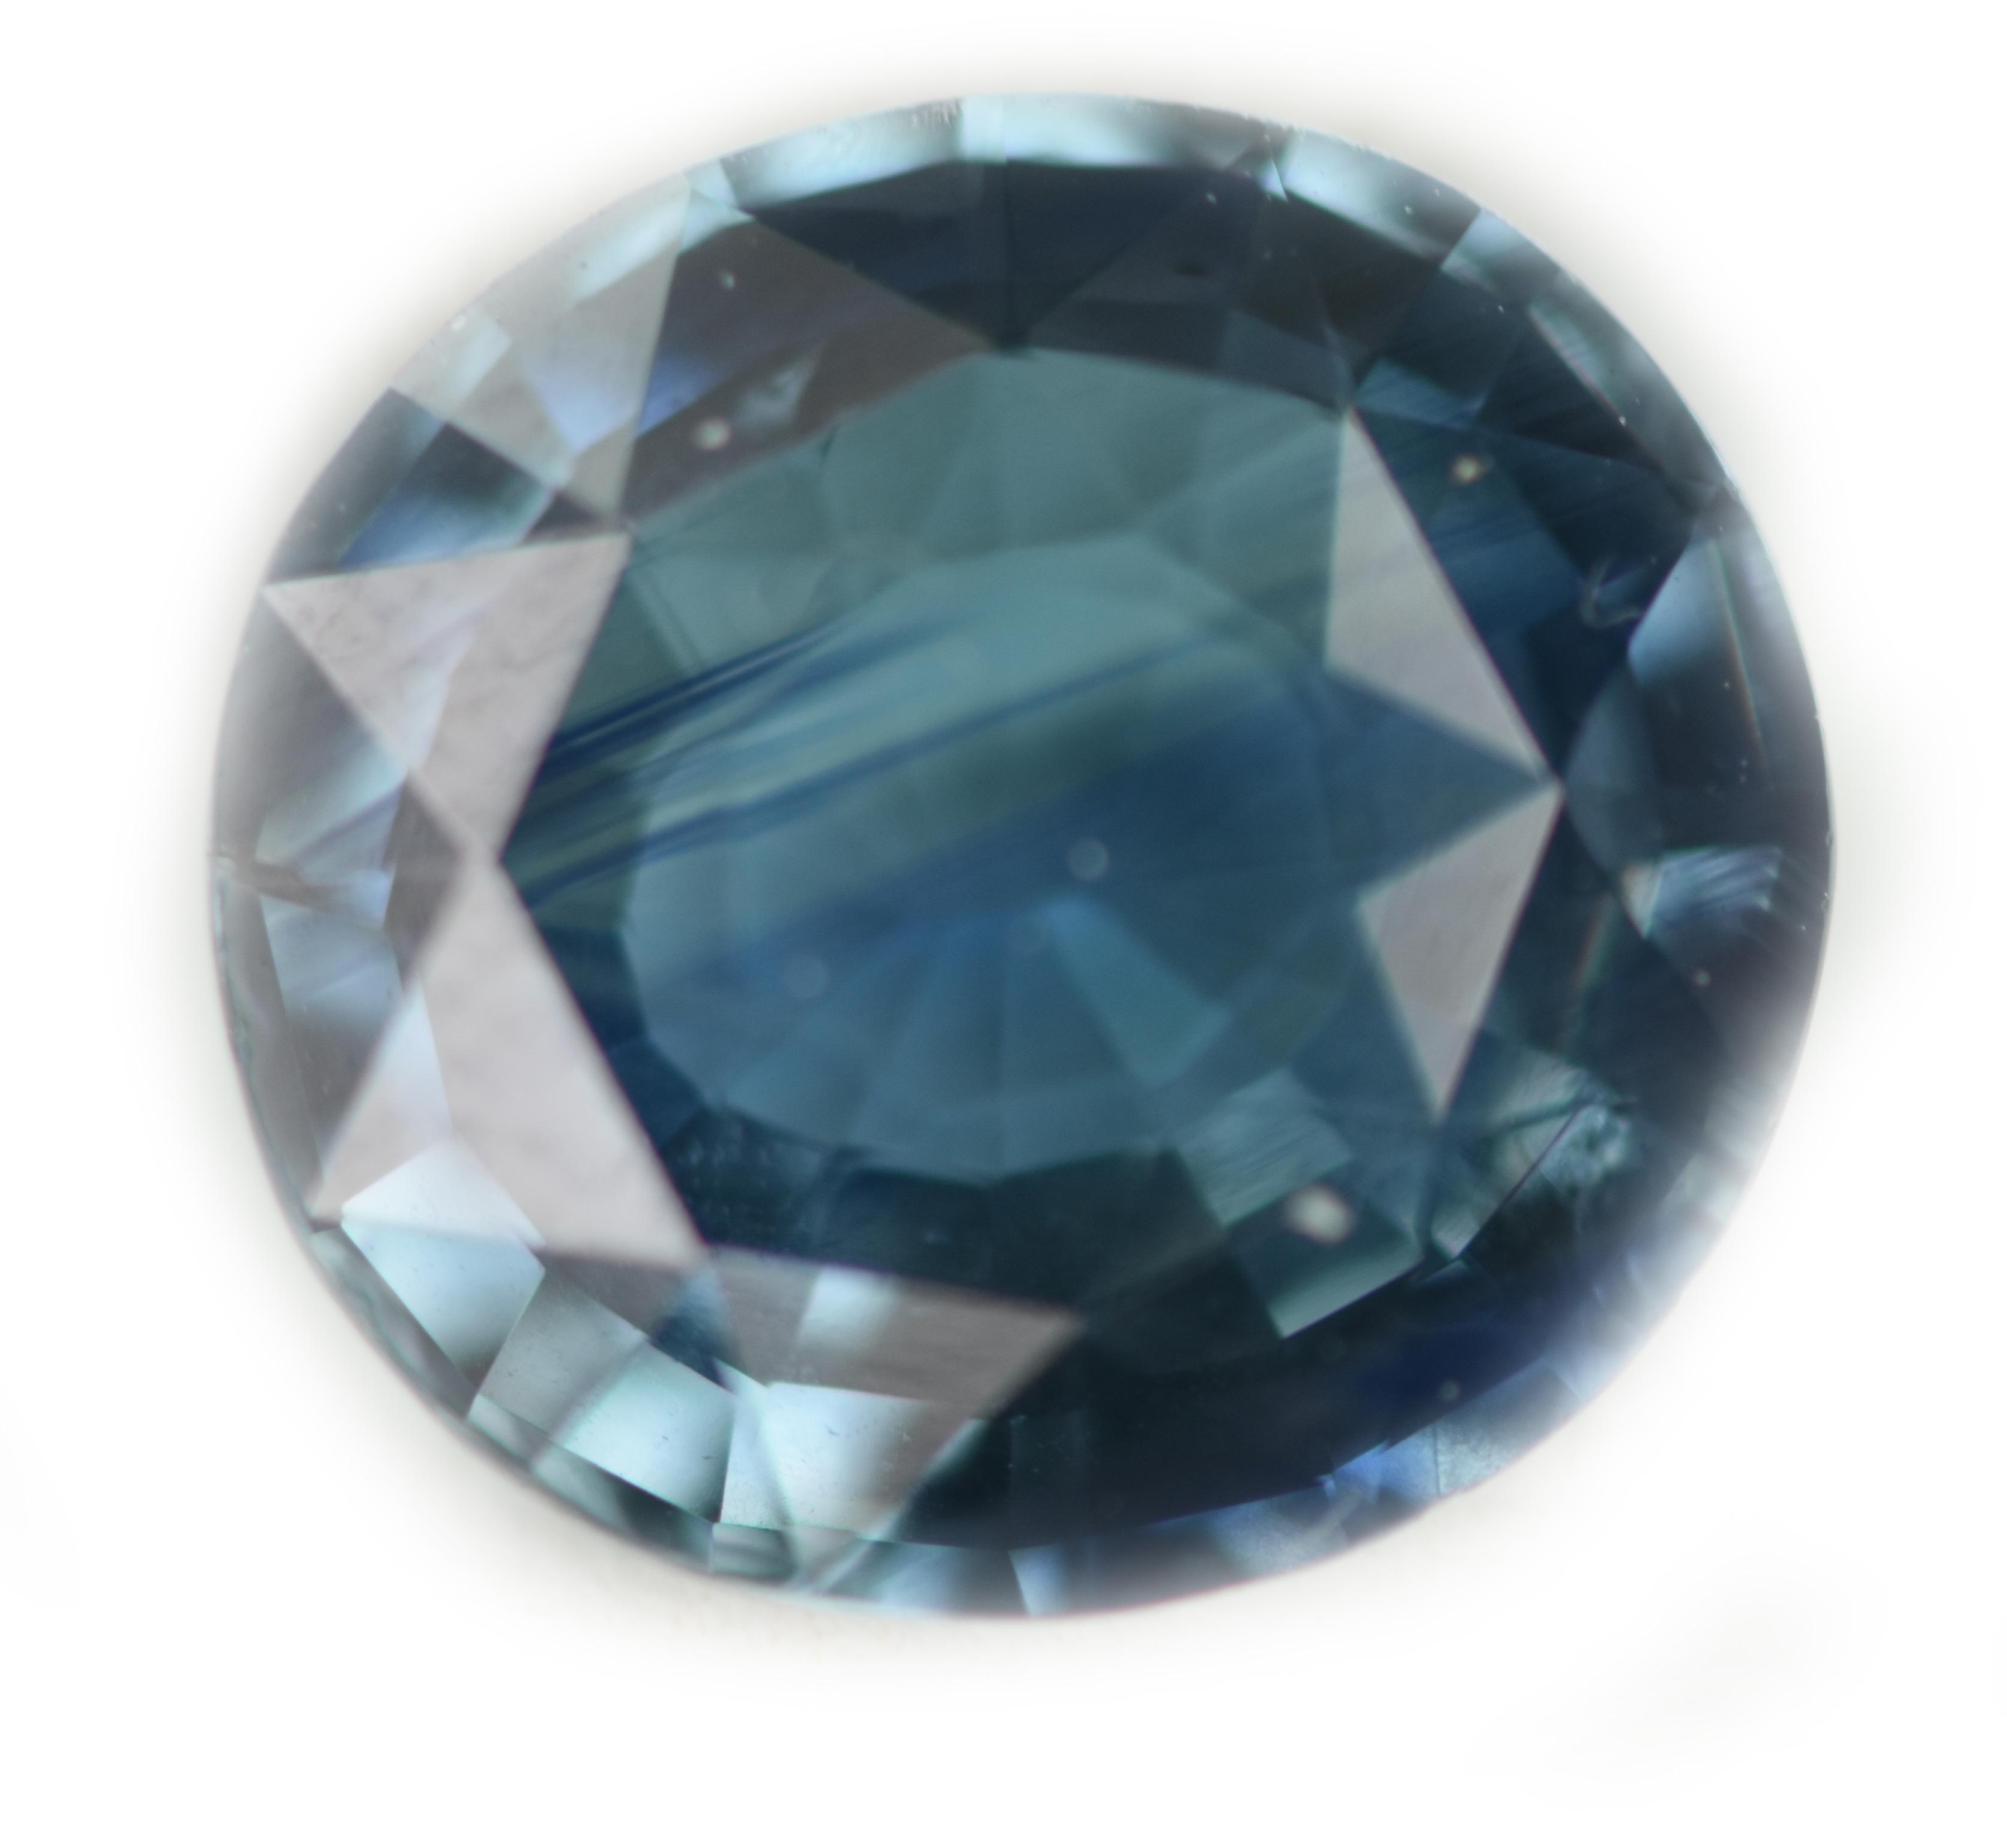 RGL Certified Teal Blue Oval Sapphire 3.77 Carats 10.0x9.3x4.6mm